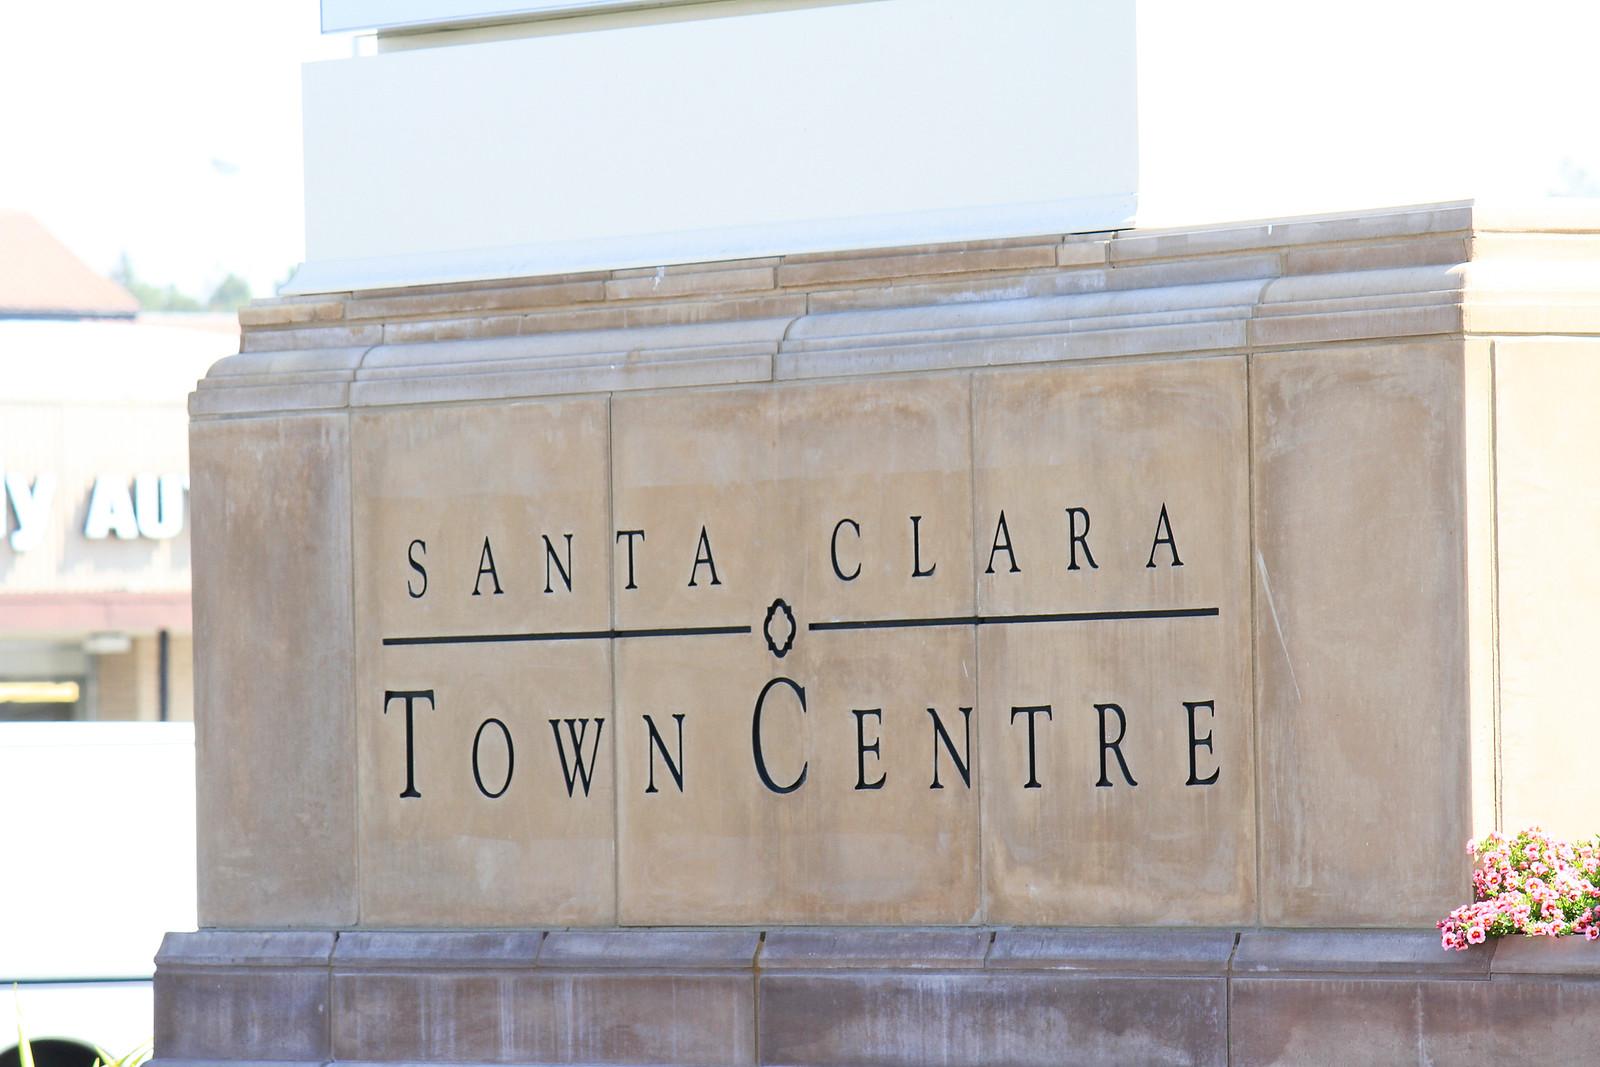 Santa Clara Town Centre Blu Skye Media-9-X3.jpg